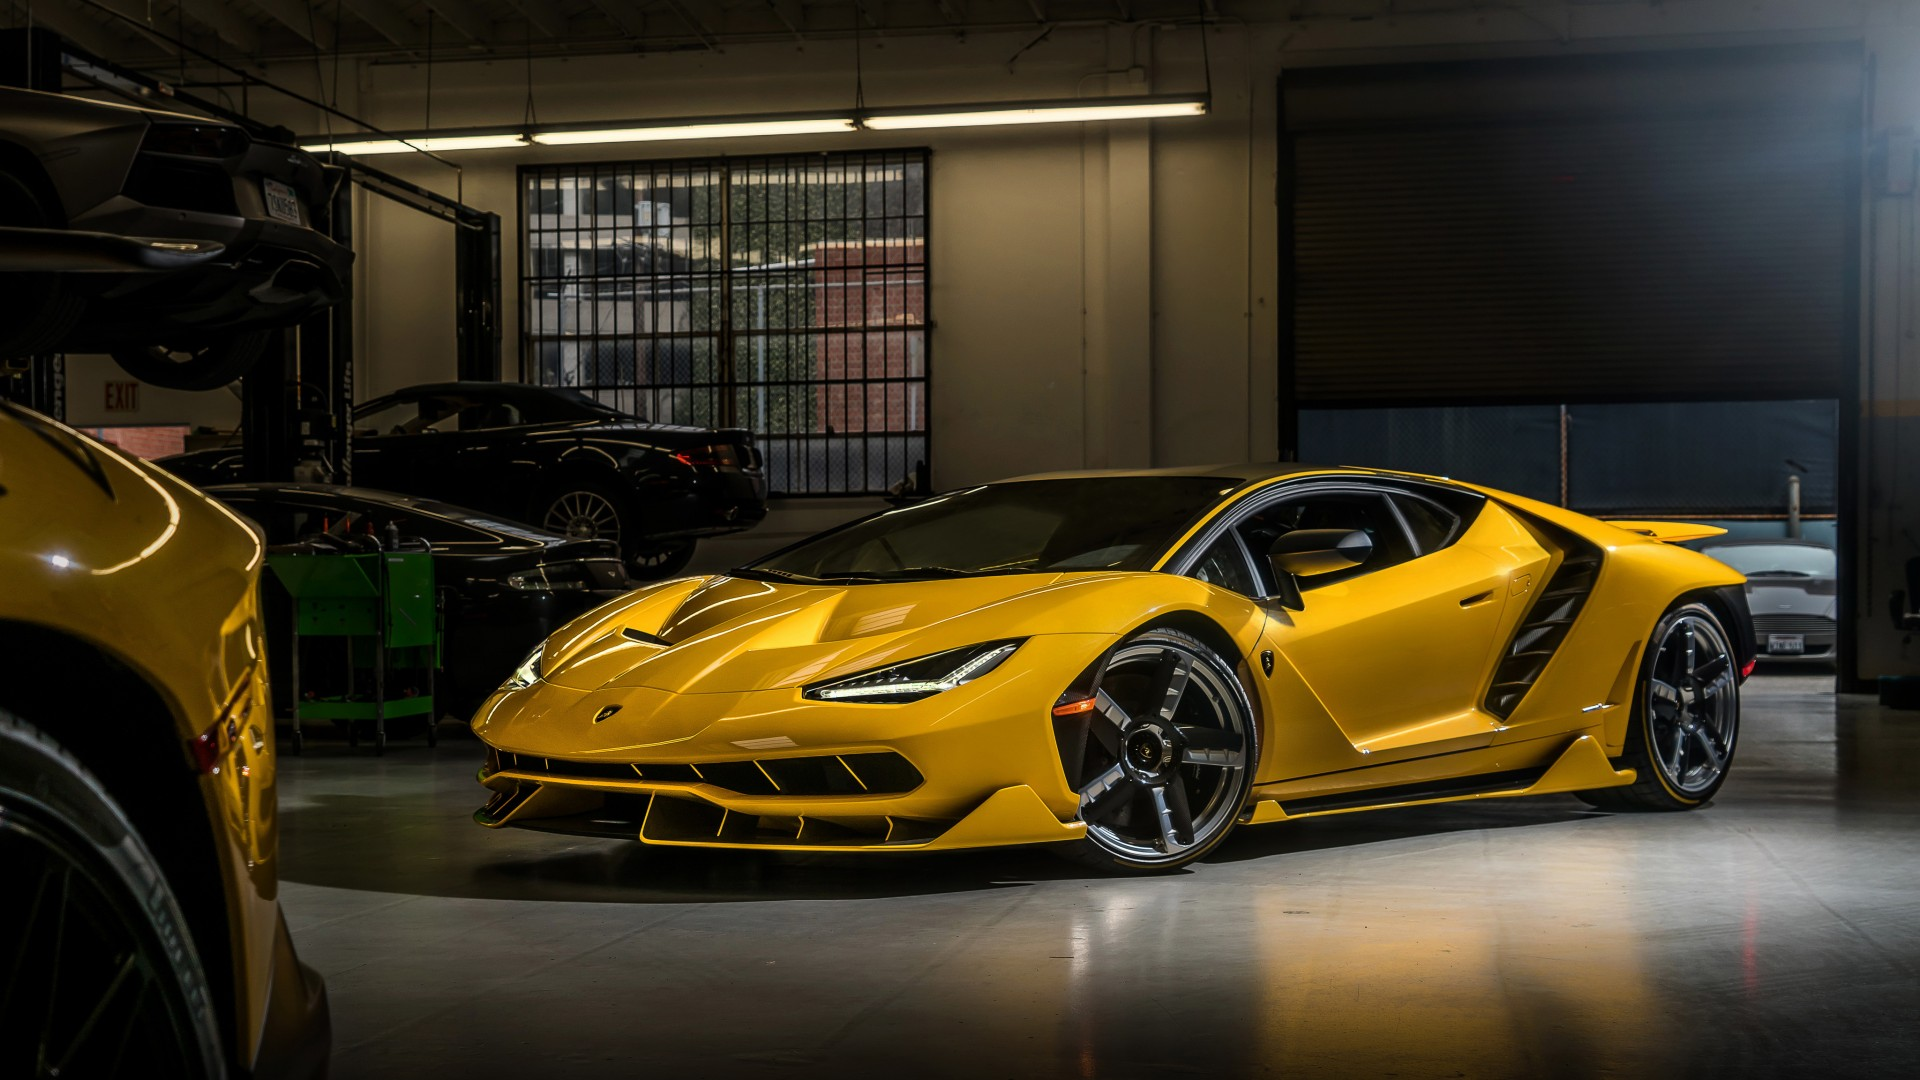 Lamborghini Centenario Coupe 4K Wallpaper | HD Car Wallpapers | ID #9380